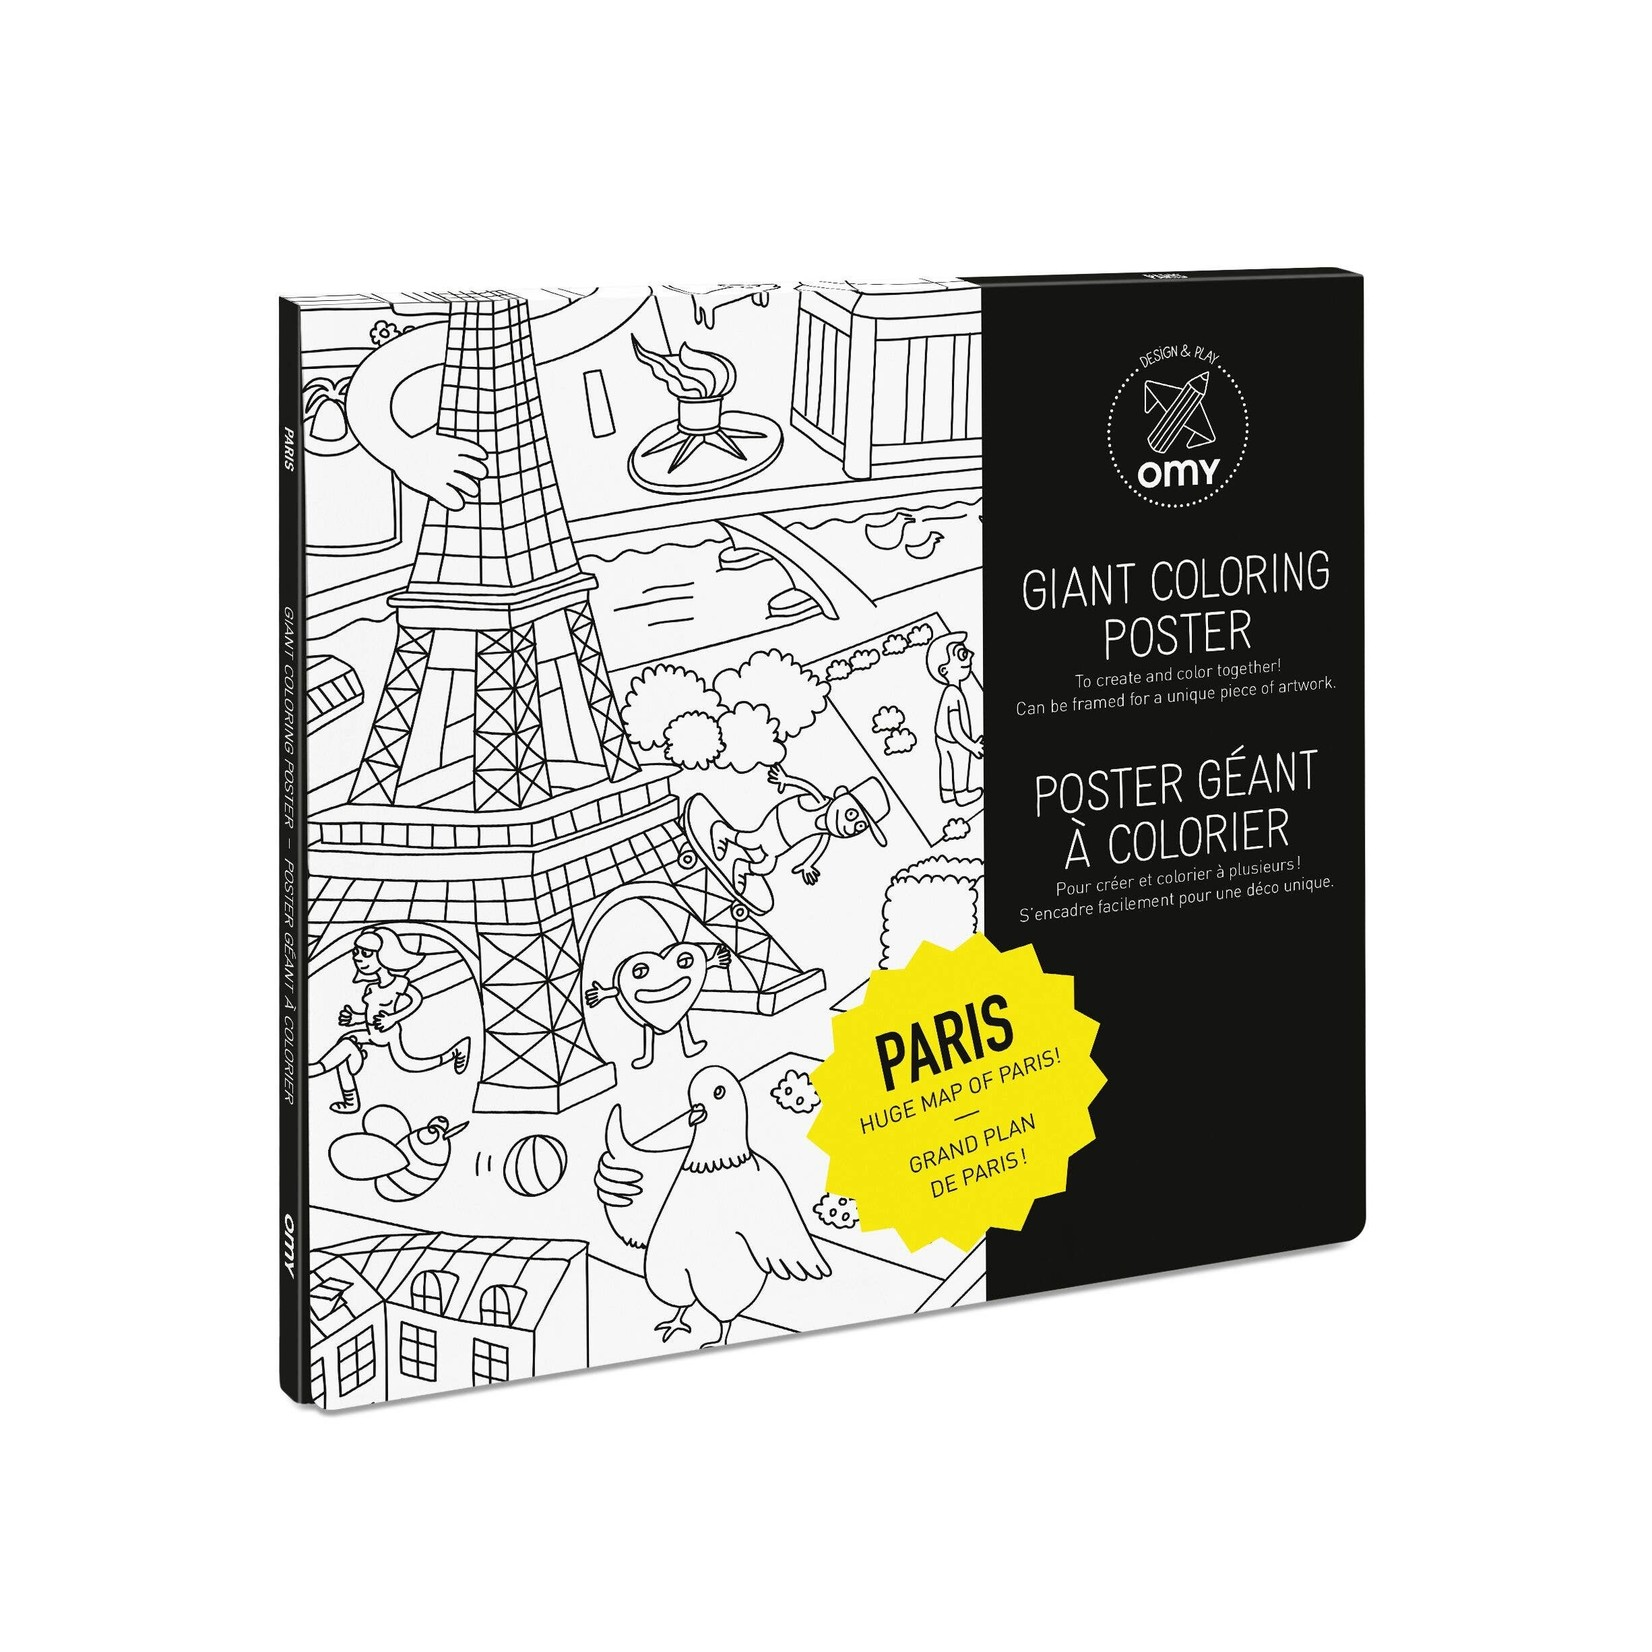 Paris Giant Coloring Poster